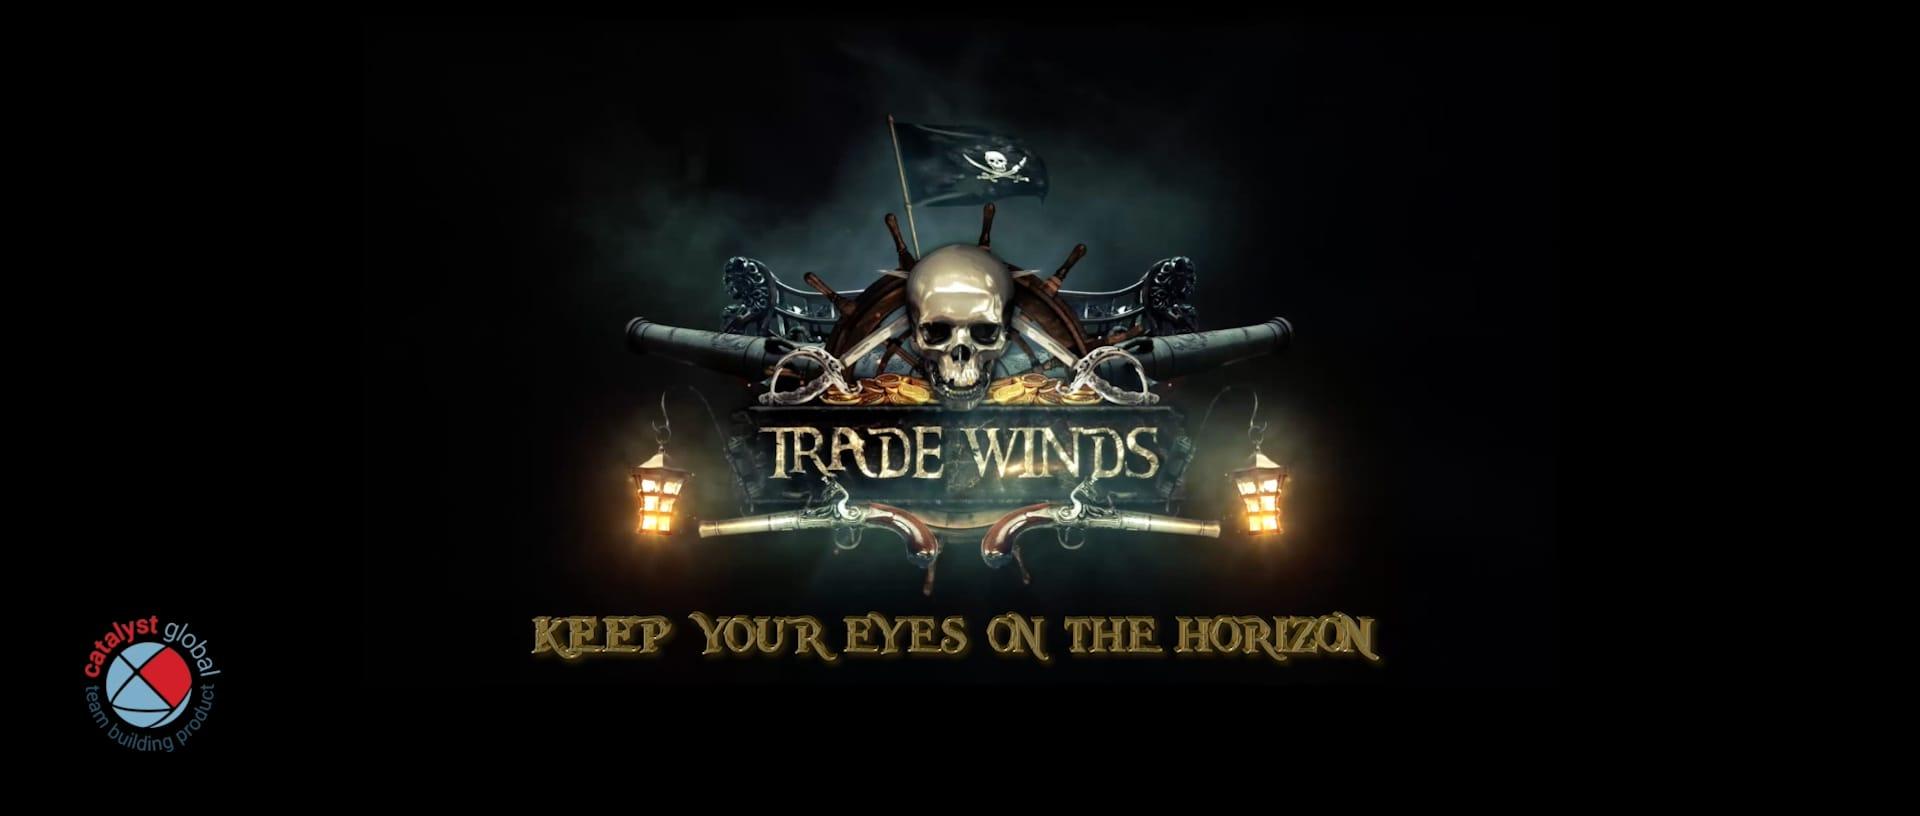 Trade Winds teambuilding aktivita na eventy a konferencie logo